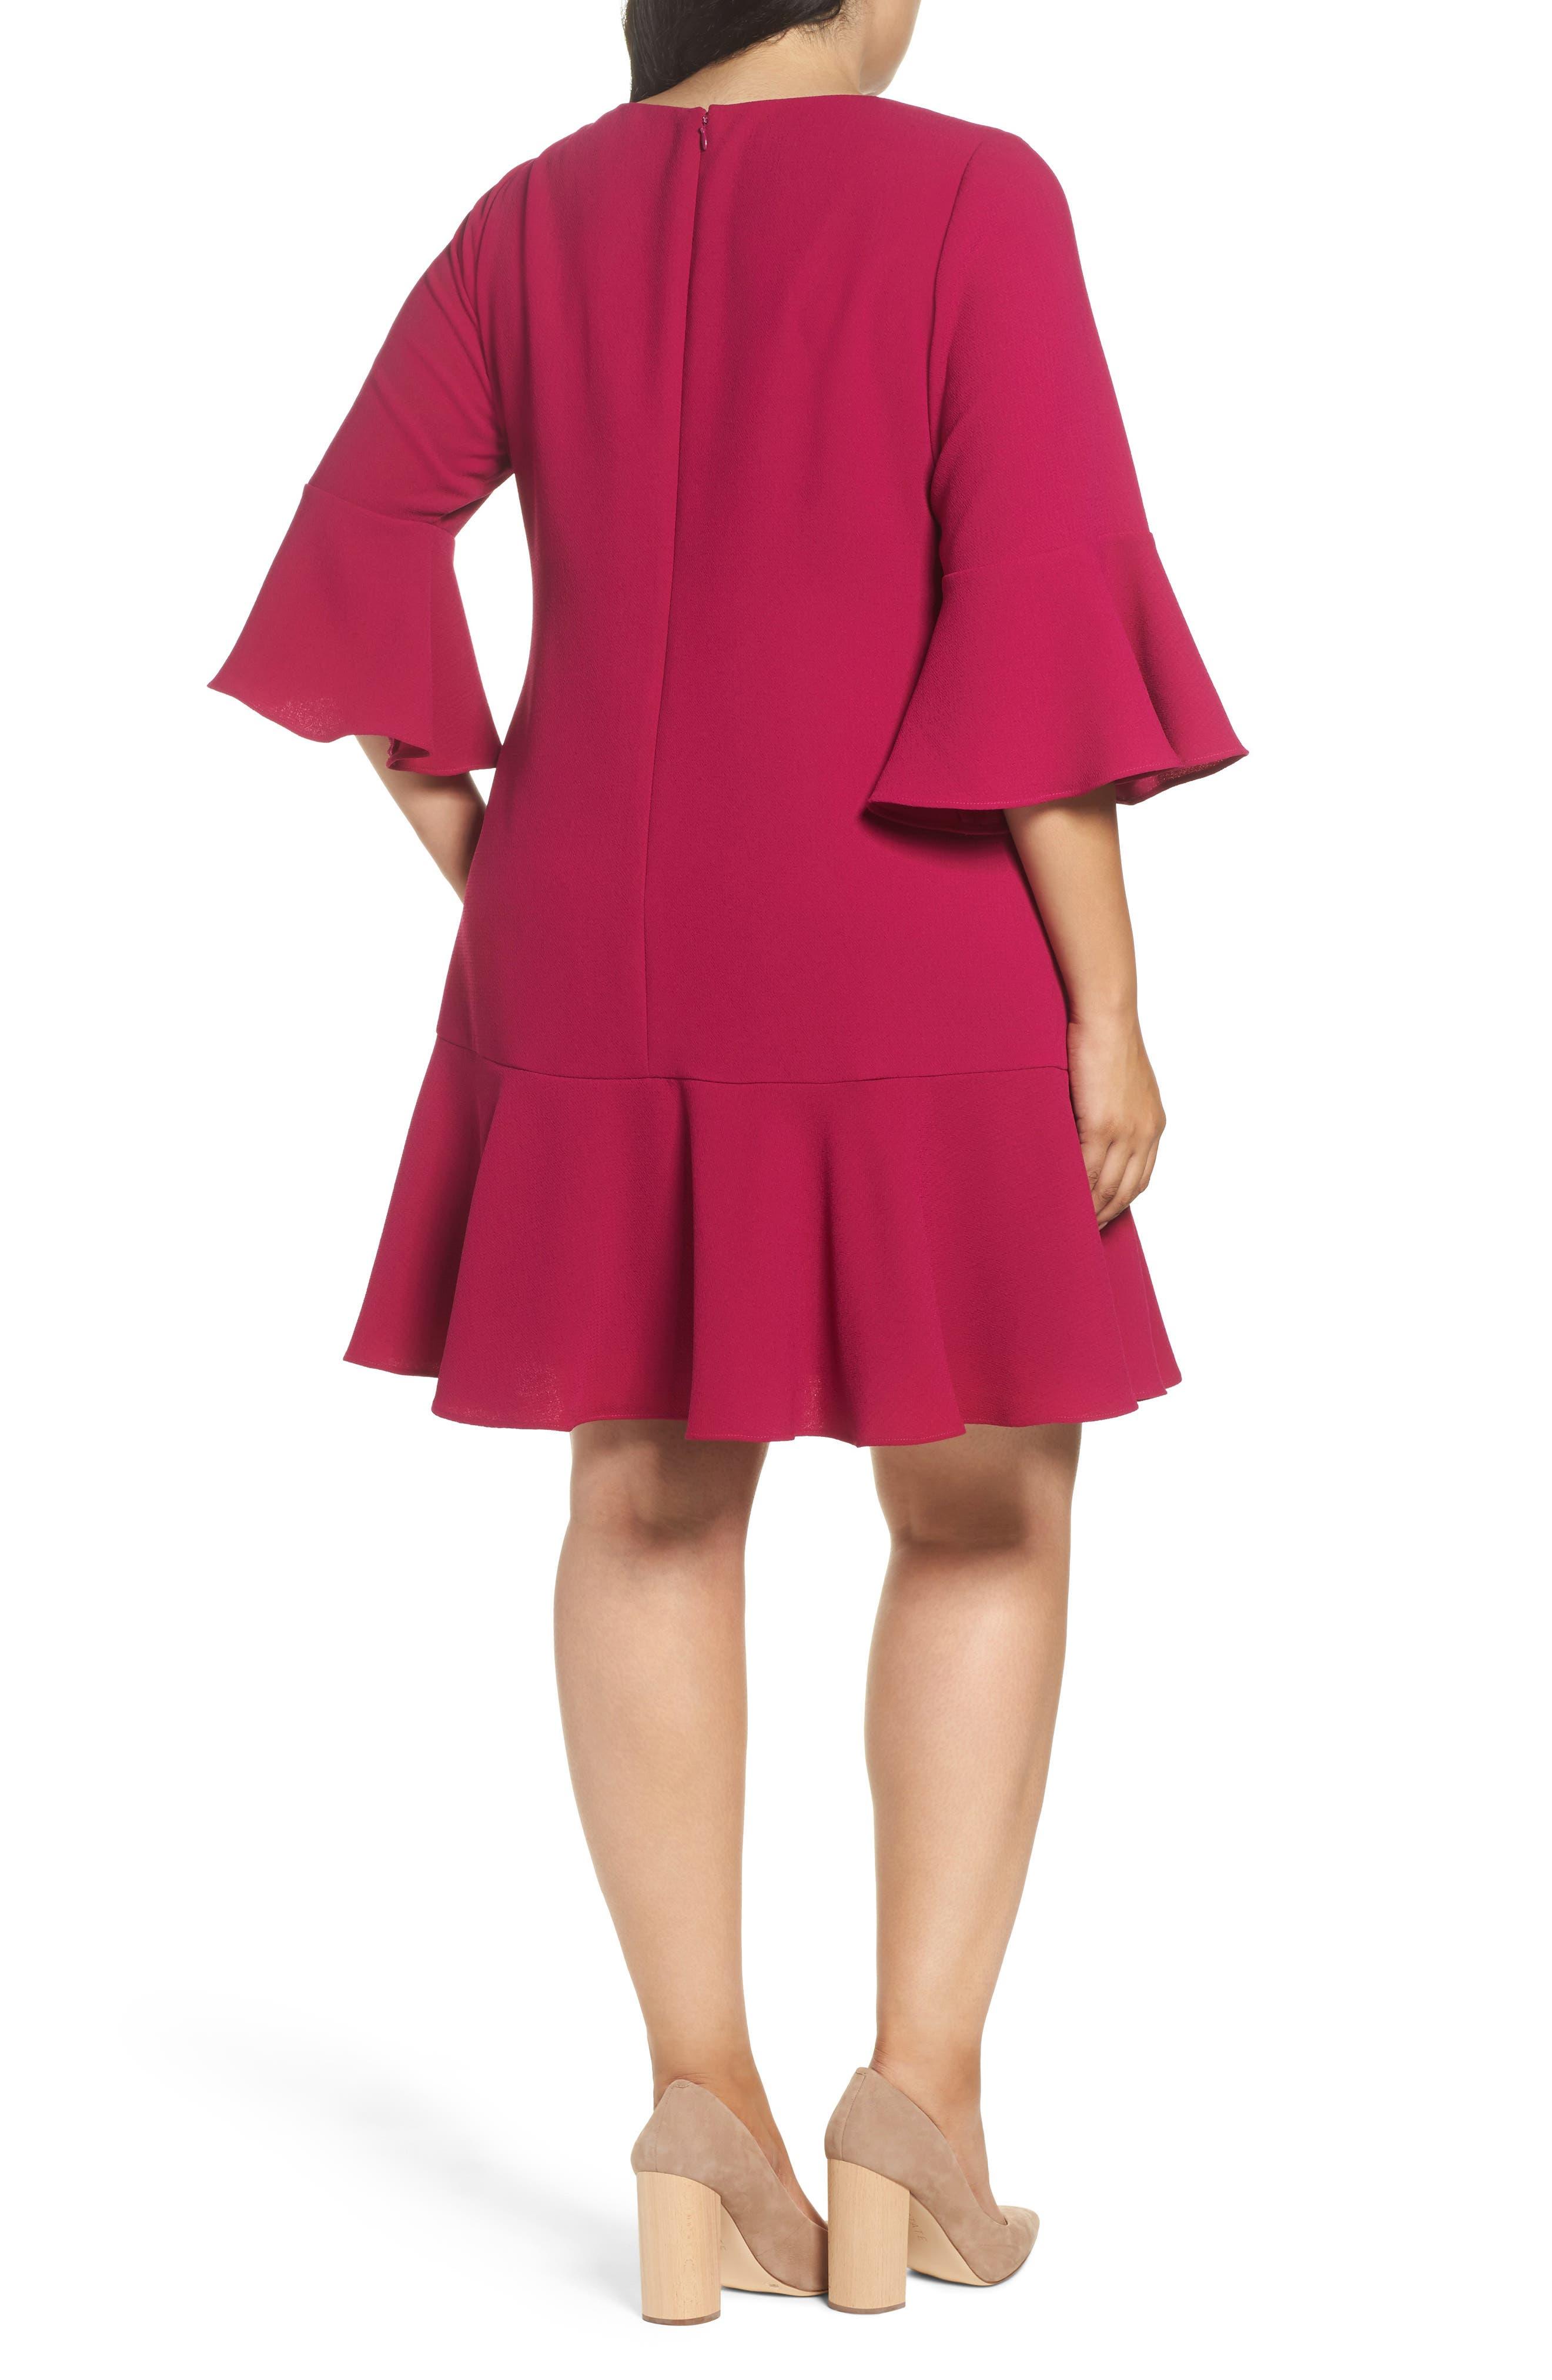 Ruffled Flounce A-Line Dress,                             Alternate thumbnail 2, color,                             678